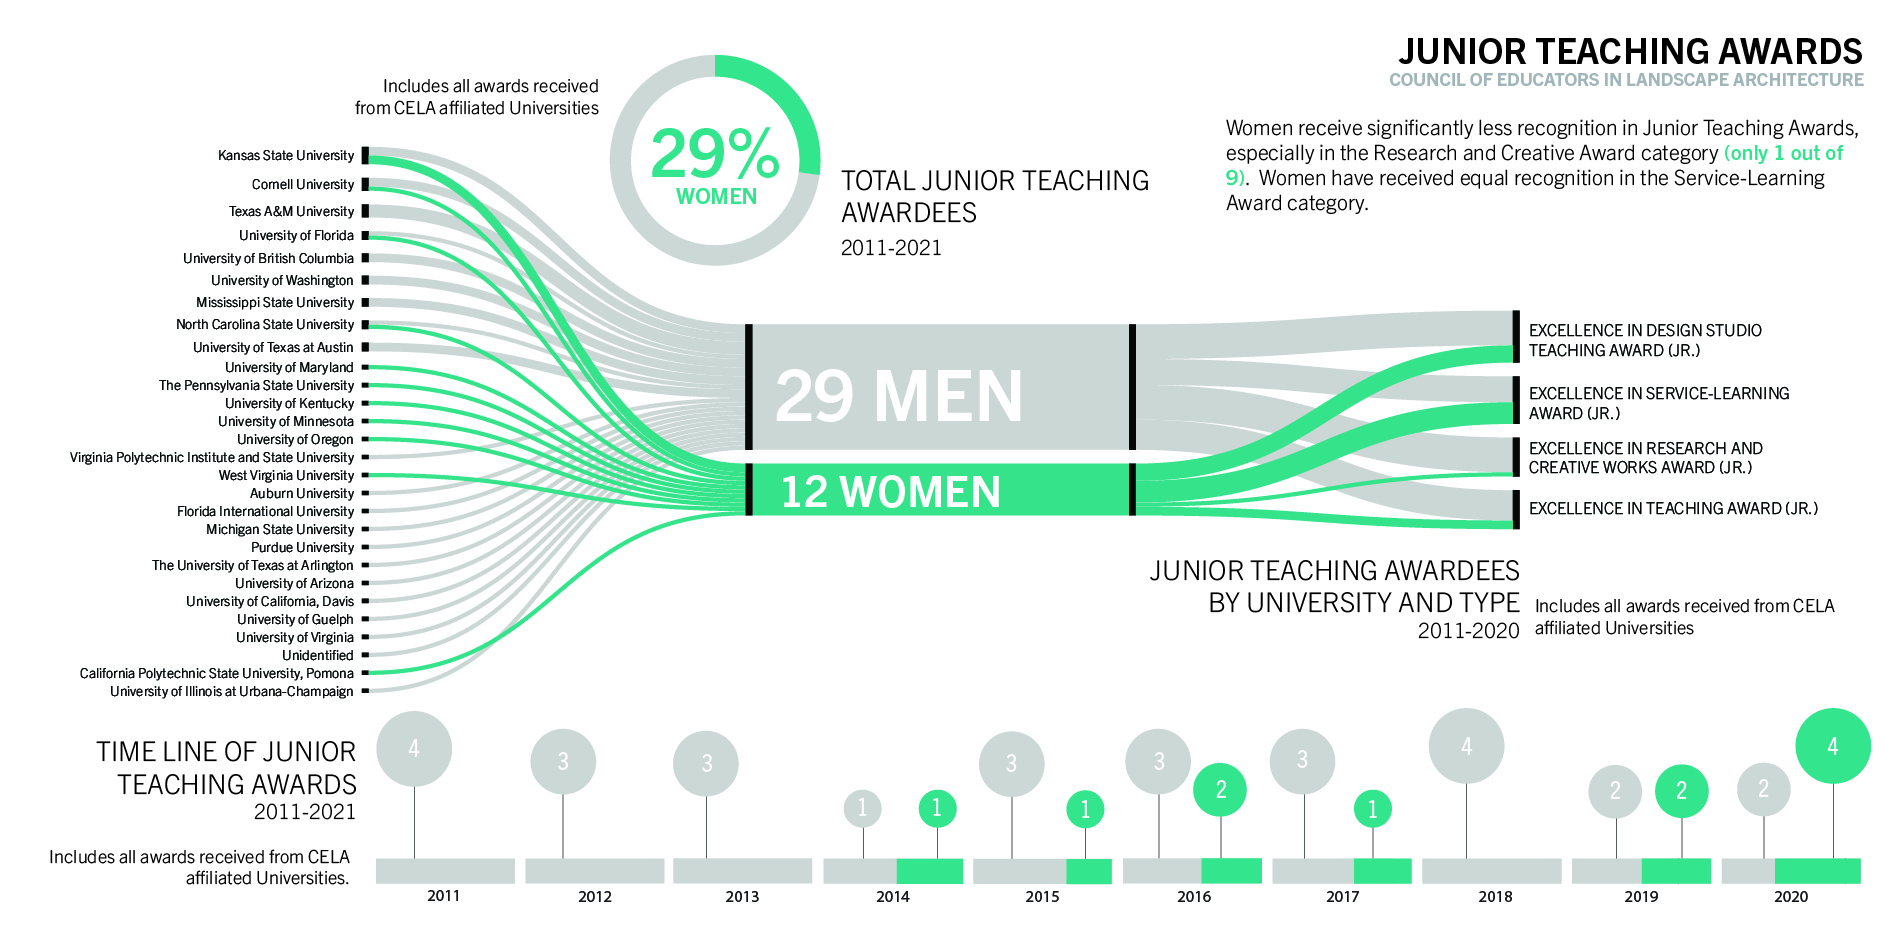 Junior Teaching Awards